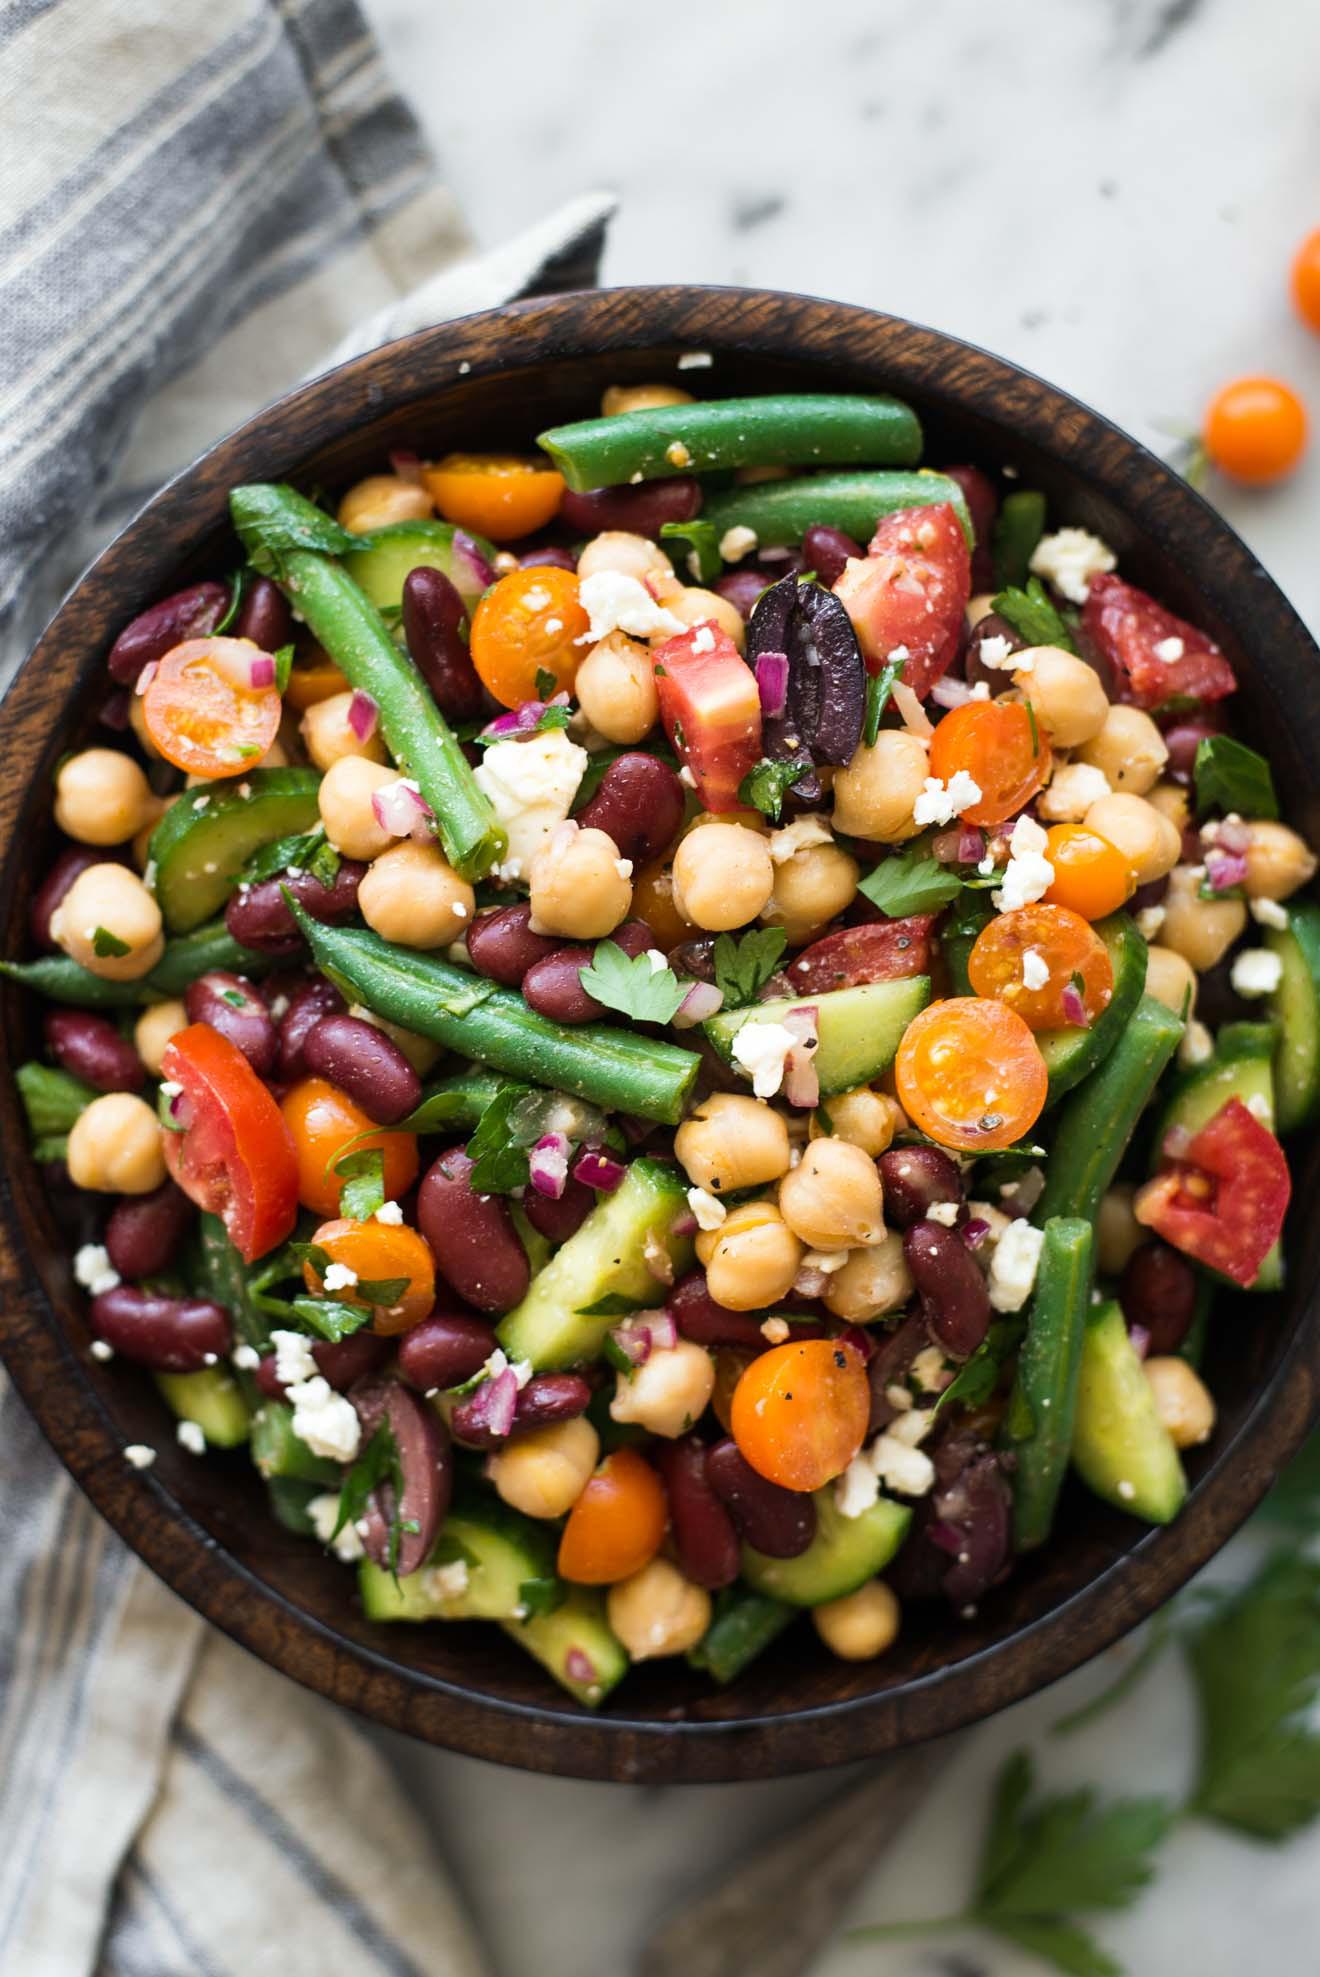 Healthy Kidney Bean Recipes  Mediterranean Three Bean Salad